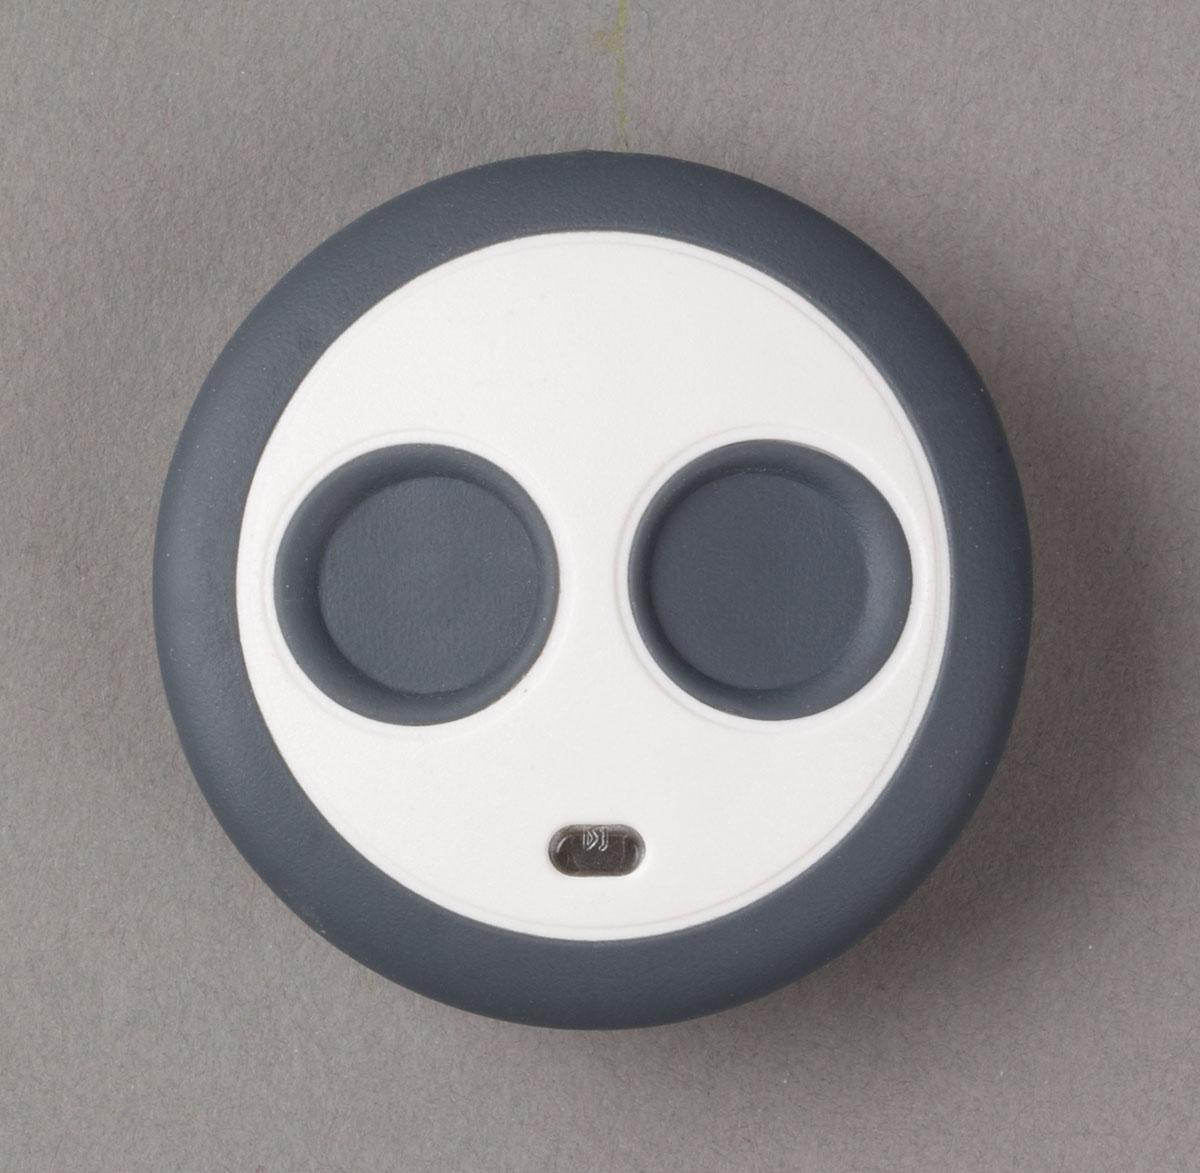 Honeywell 5802wxt 2 2 Button Panic Advanced Security Llc